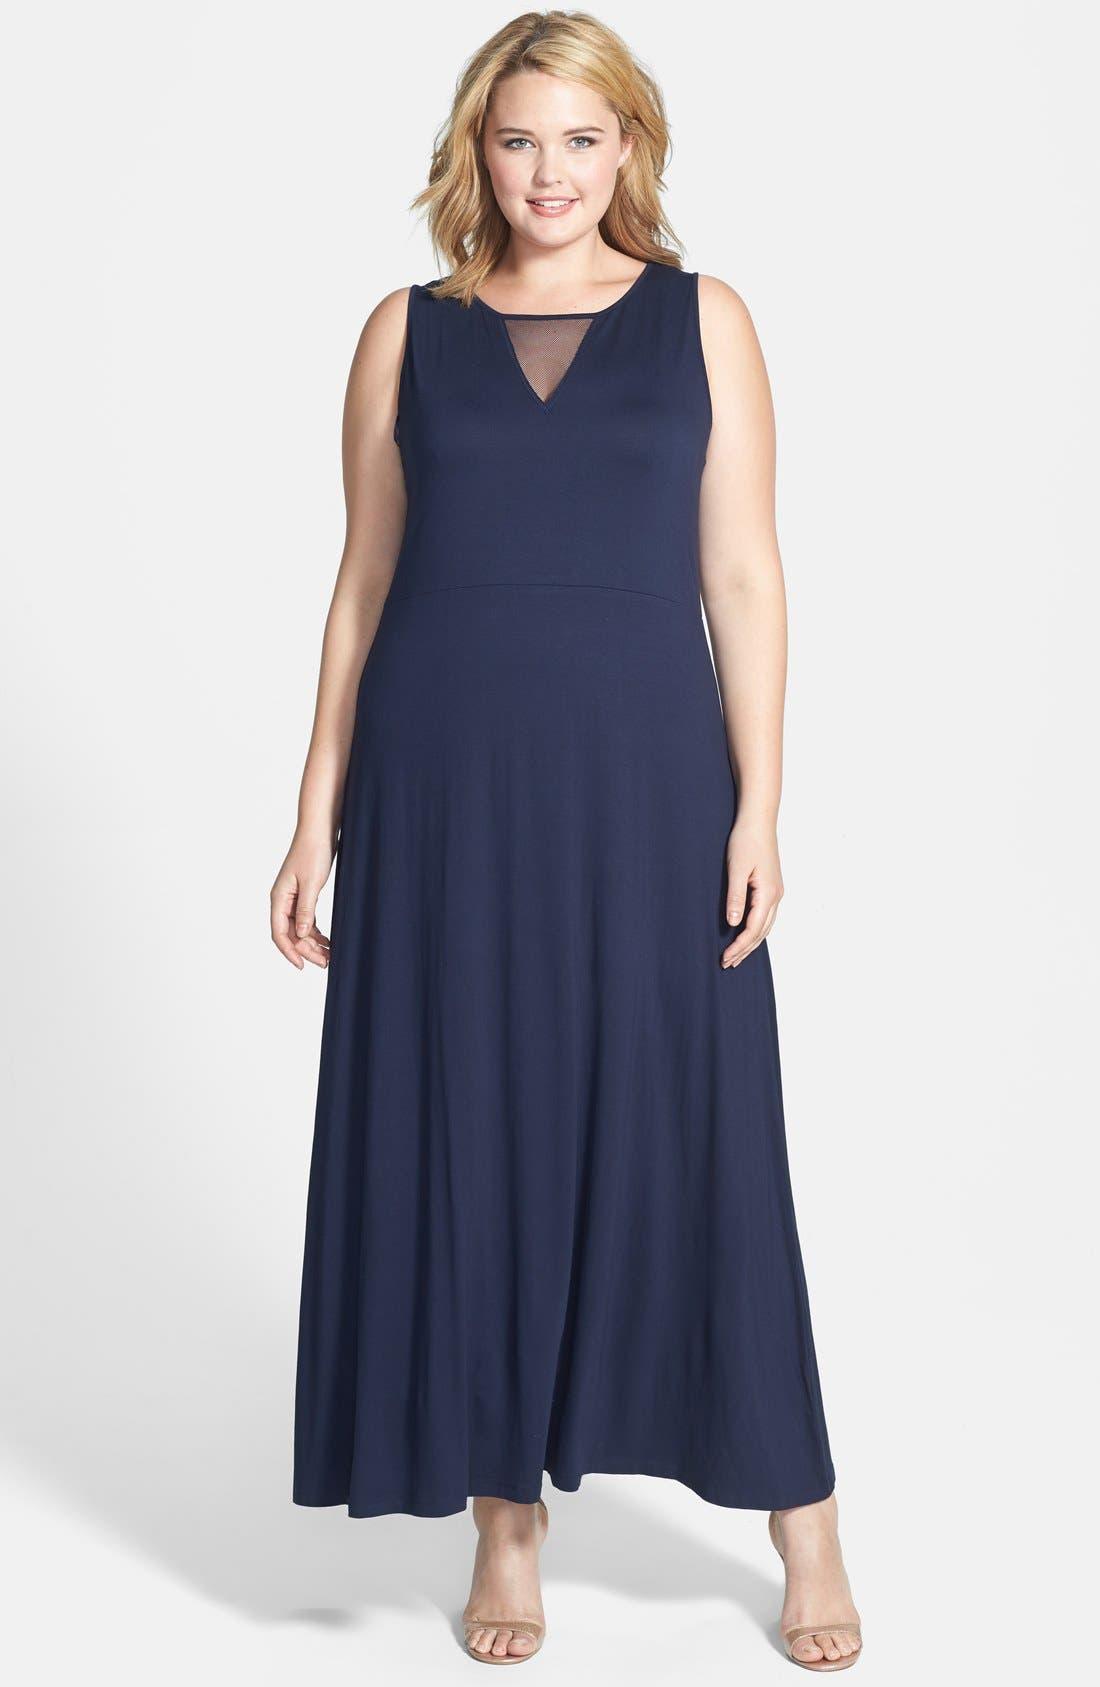 Main Image - Vince Camuto Mesh Inset Maxi Dress (Plus Size)